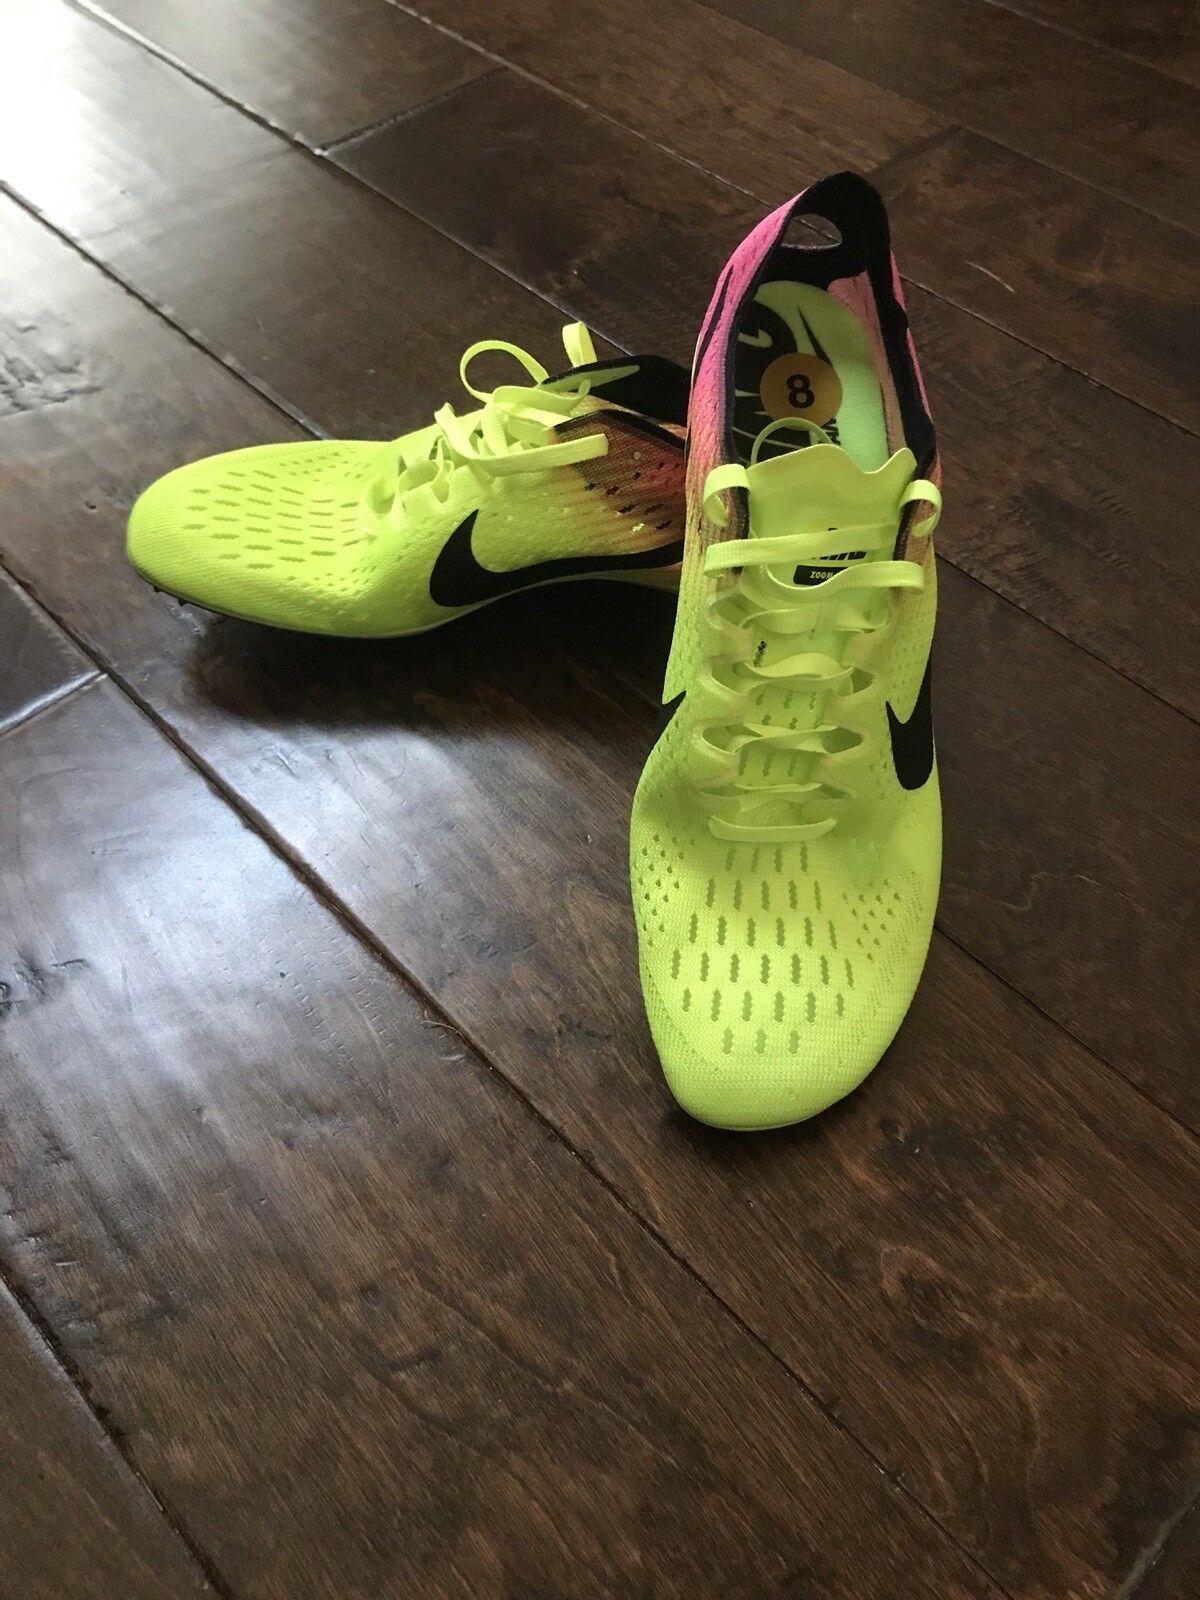 Nike zoom vittoria 3 oc track & field punte 12 rosa scarpe nere 882006-999 12 punte volt. 54df9a